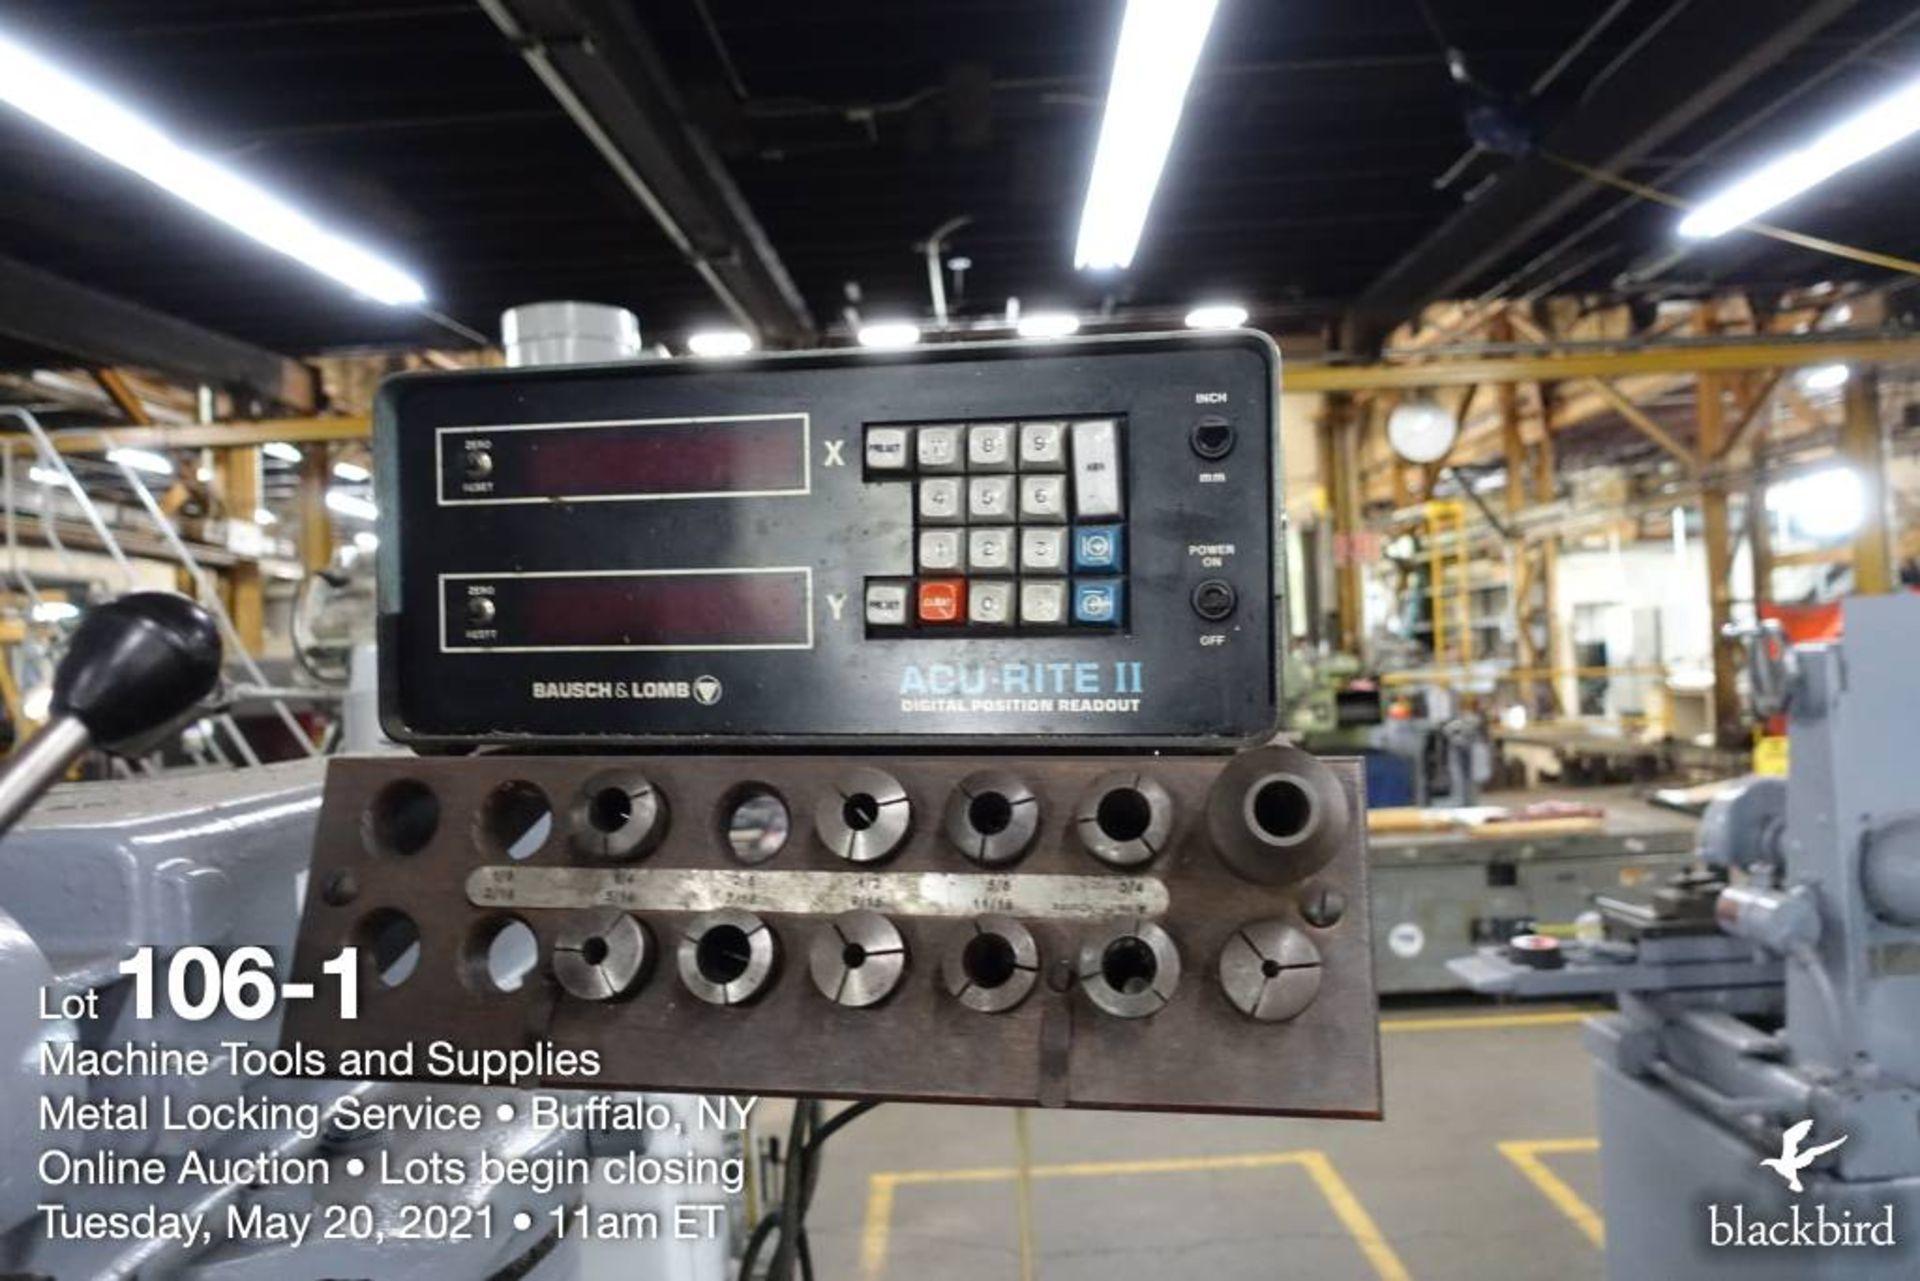 Wells Index 747 vertical milling machine, 1.5 HP - Image 2 of 5